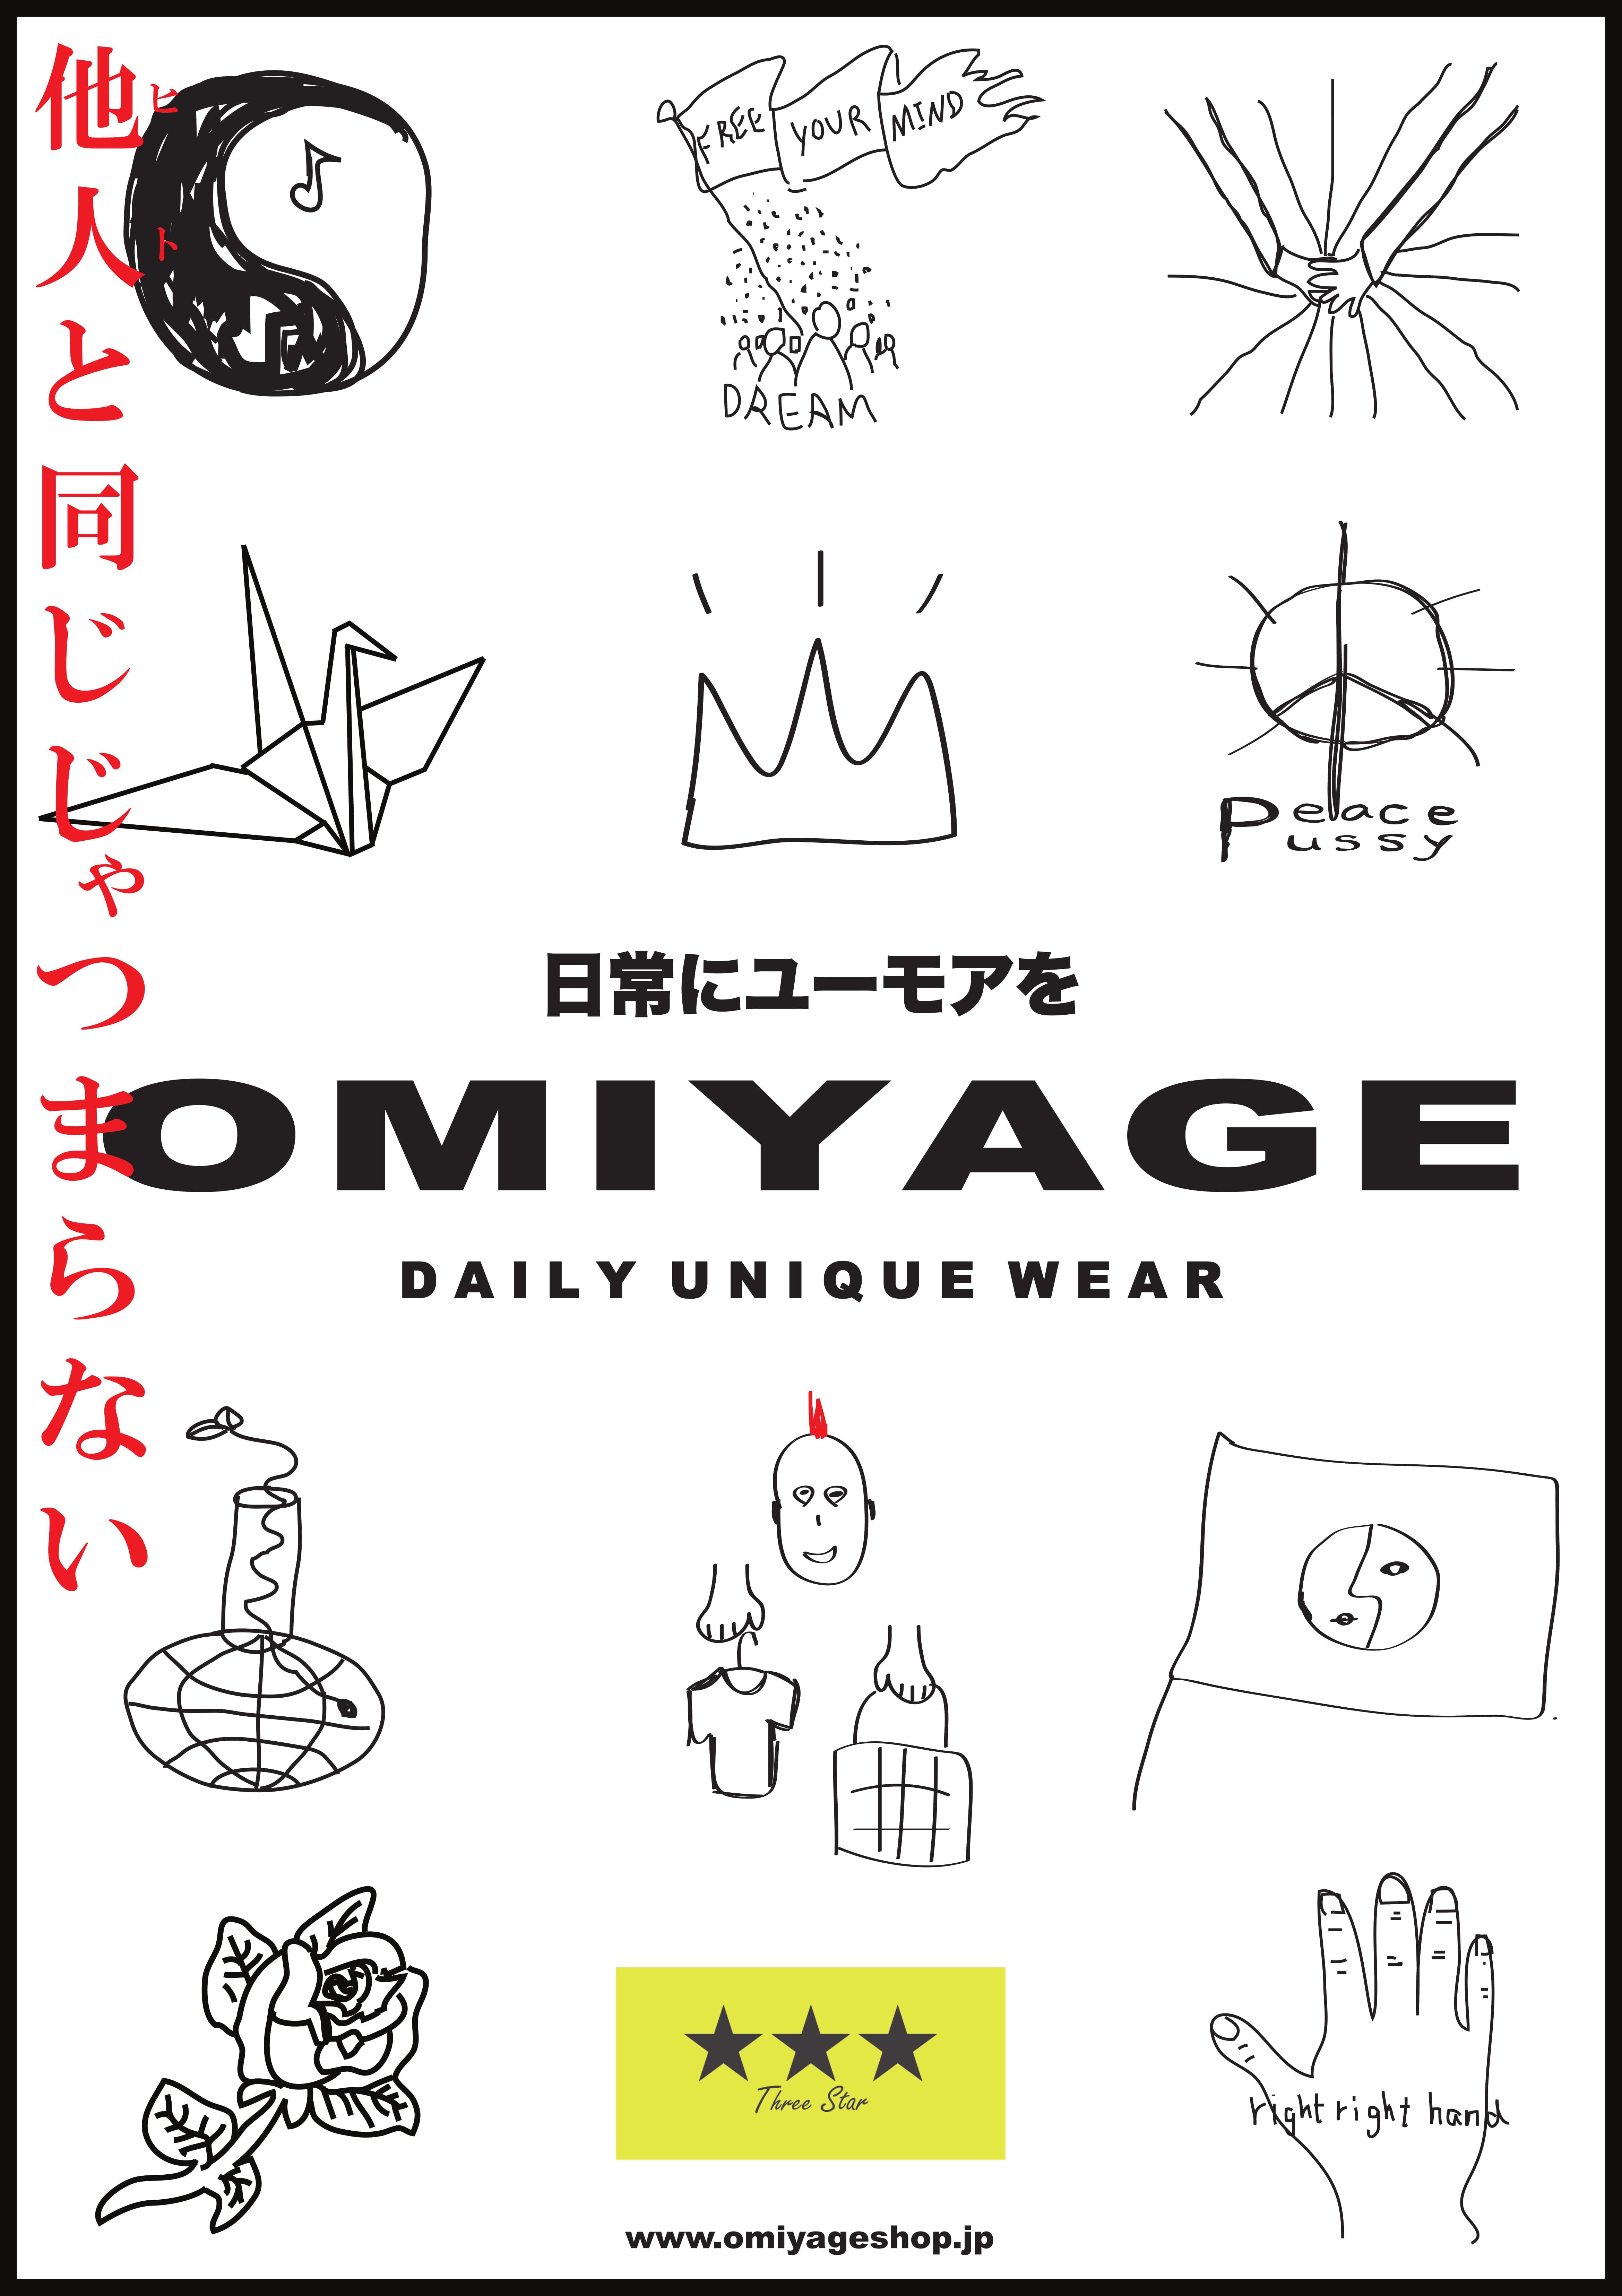 OMIYAGE-1